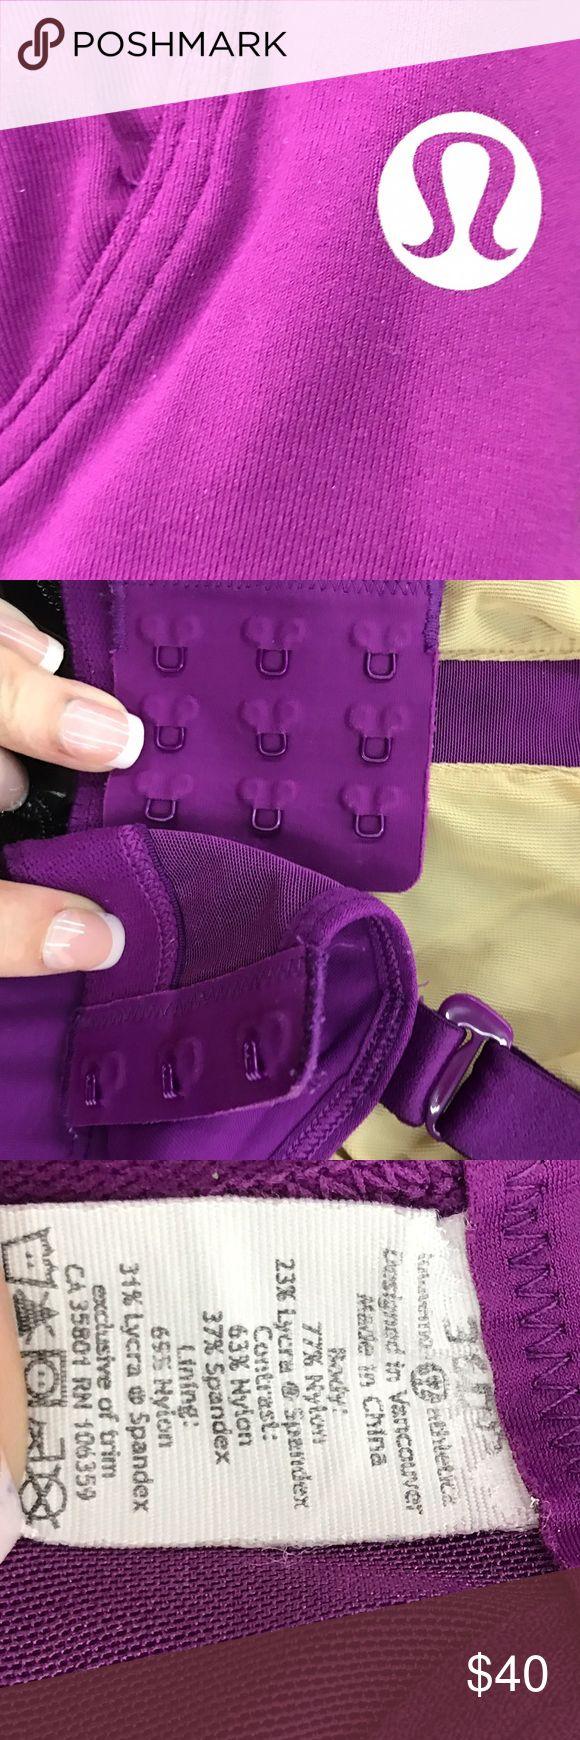 Lululemon Sports Bra like new Size 36 DD, purple athletic bra. No wear it stretch in it. Bra was always washed by hand so it's got a lot of life in it! Only wear is on the tag I added it on the photos. lululemon athletica Intimates & Sleepwear Bras